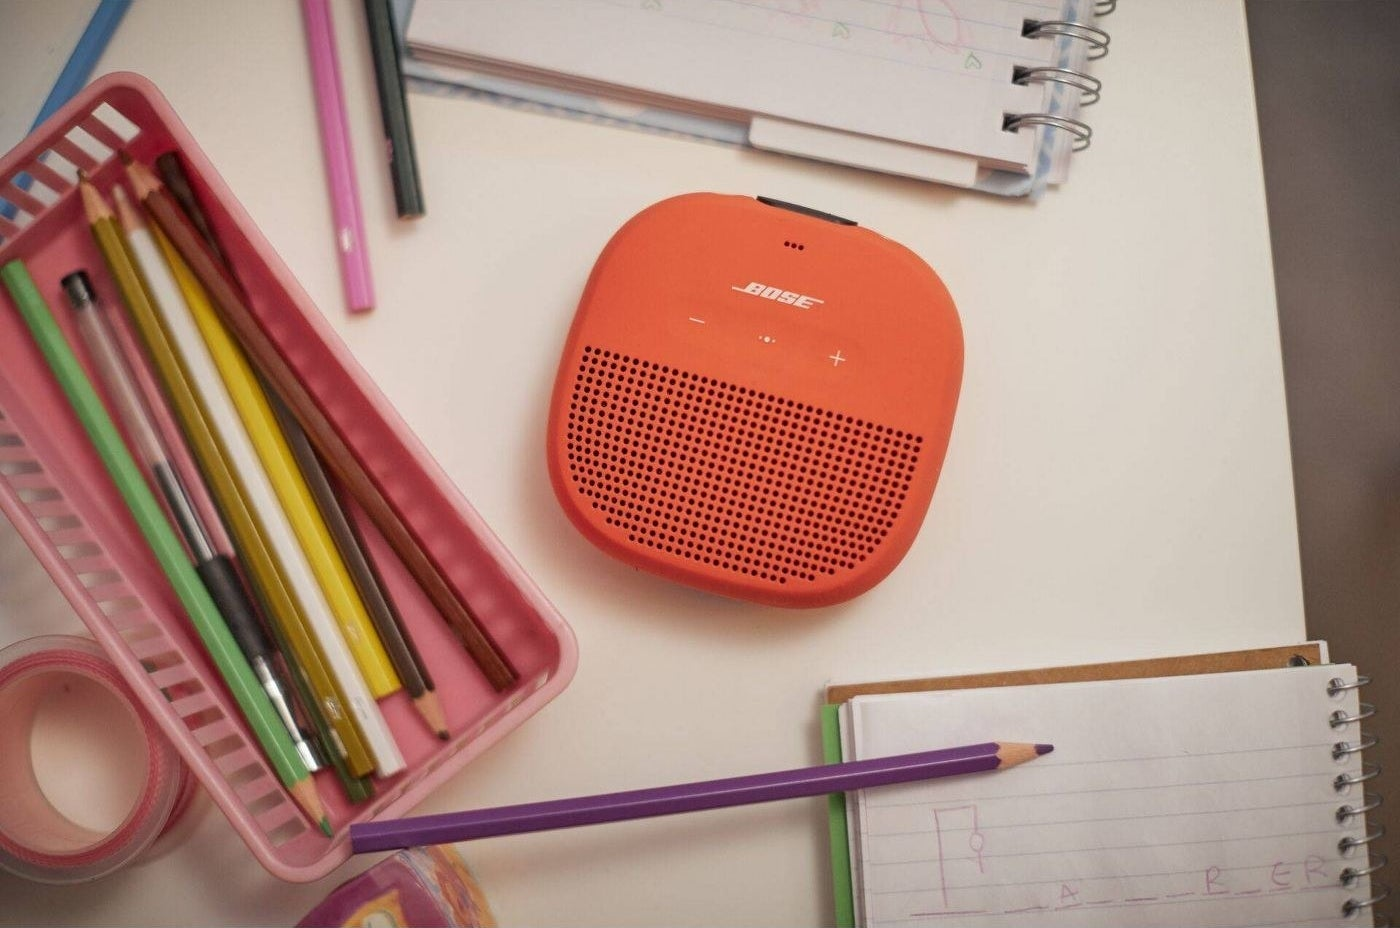 orange Bose bluetooth speaker sitting on a desk